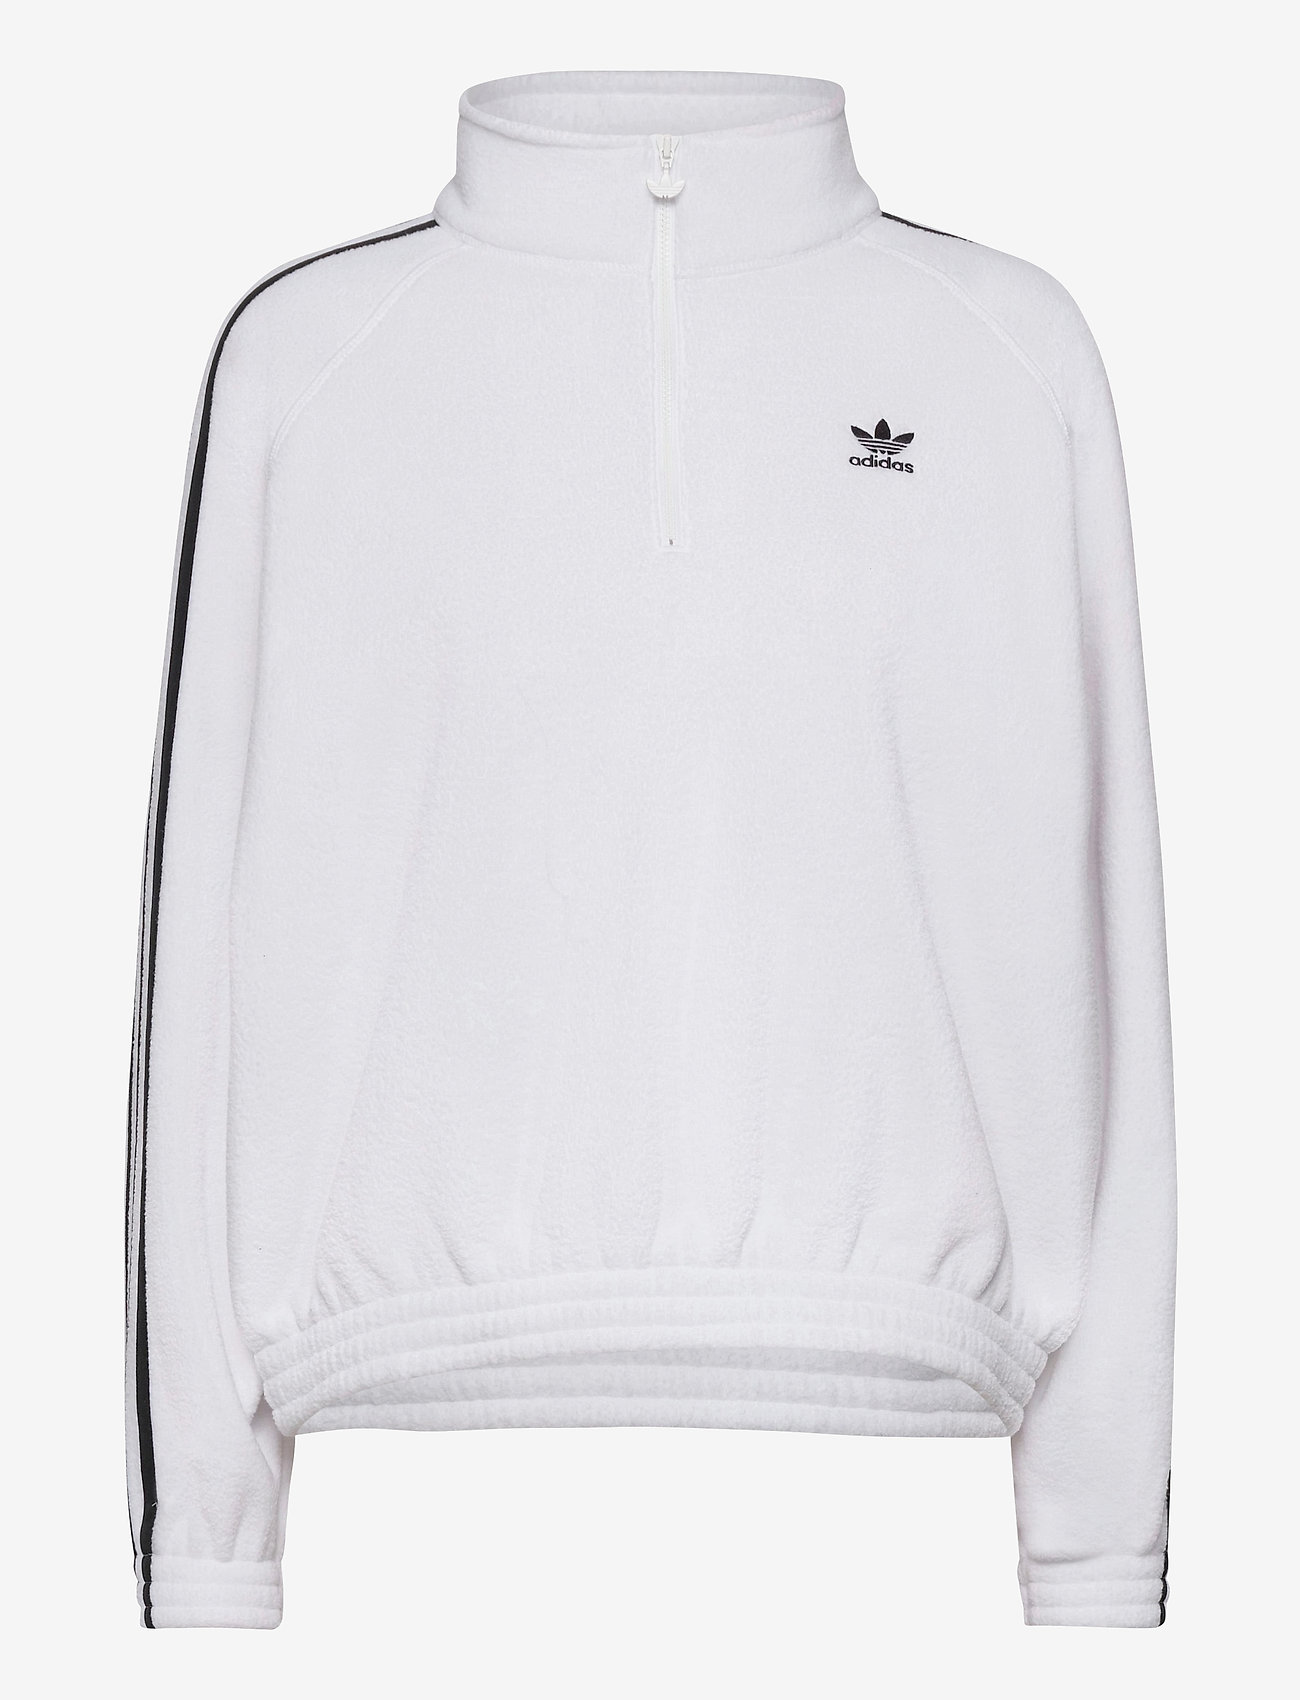 adidas Originals - Adicolor Classics Polar Fleece Half-Zip Sweatshirt W - fleece - white/black - 1